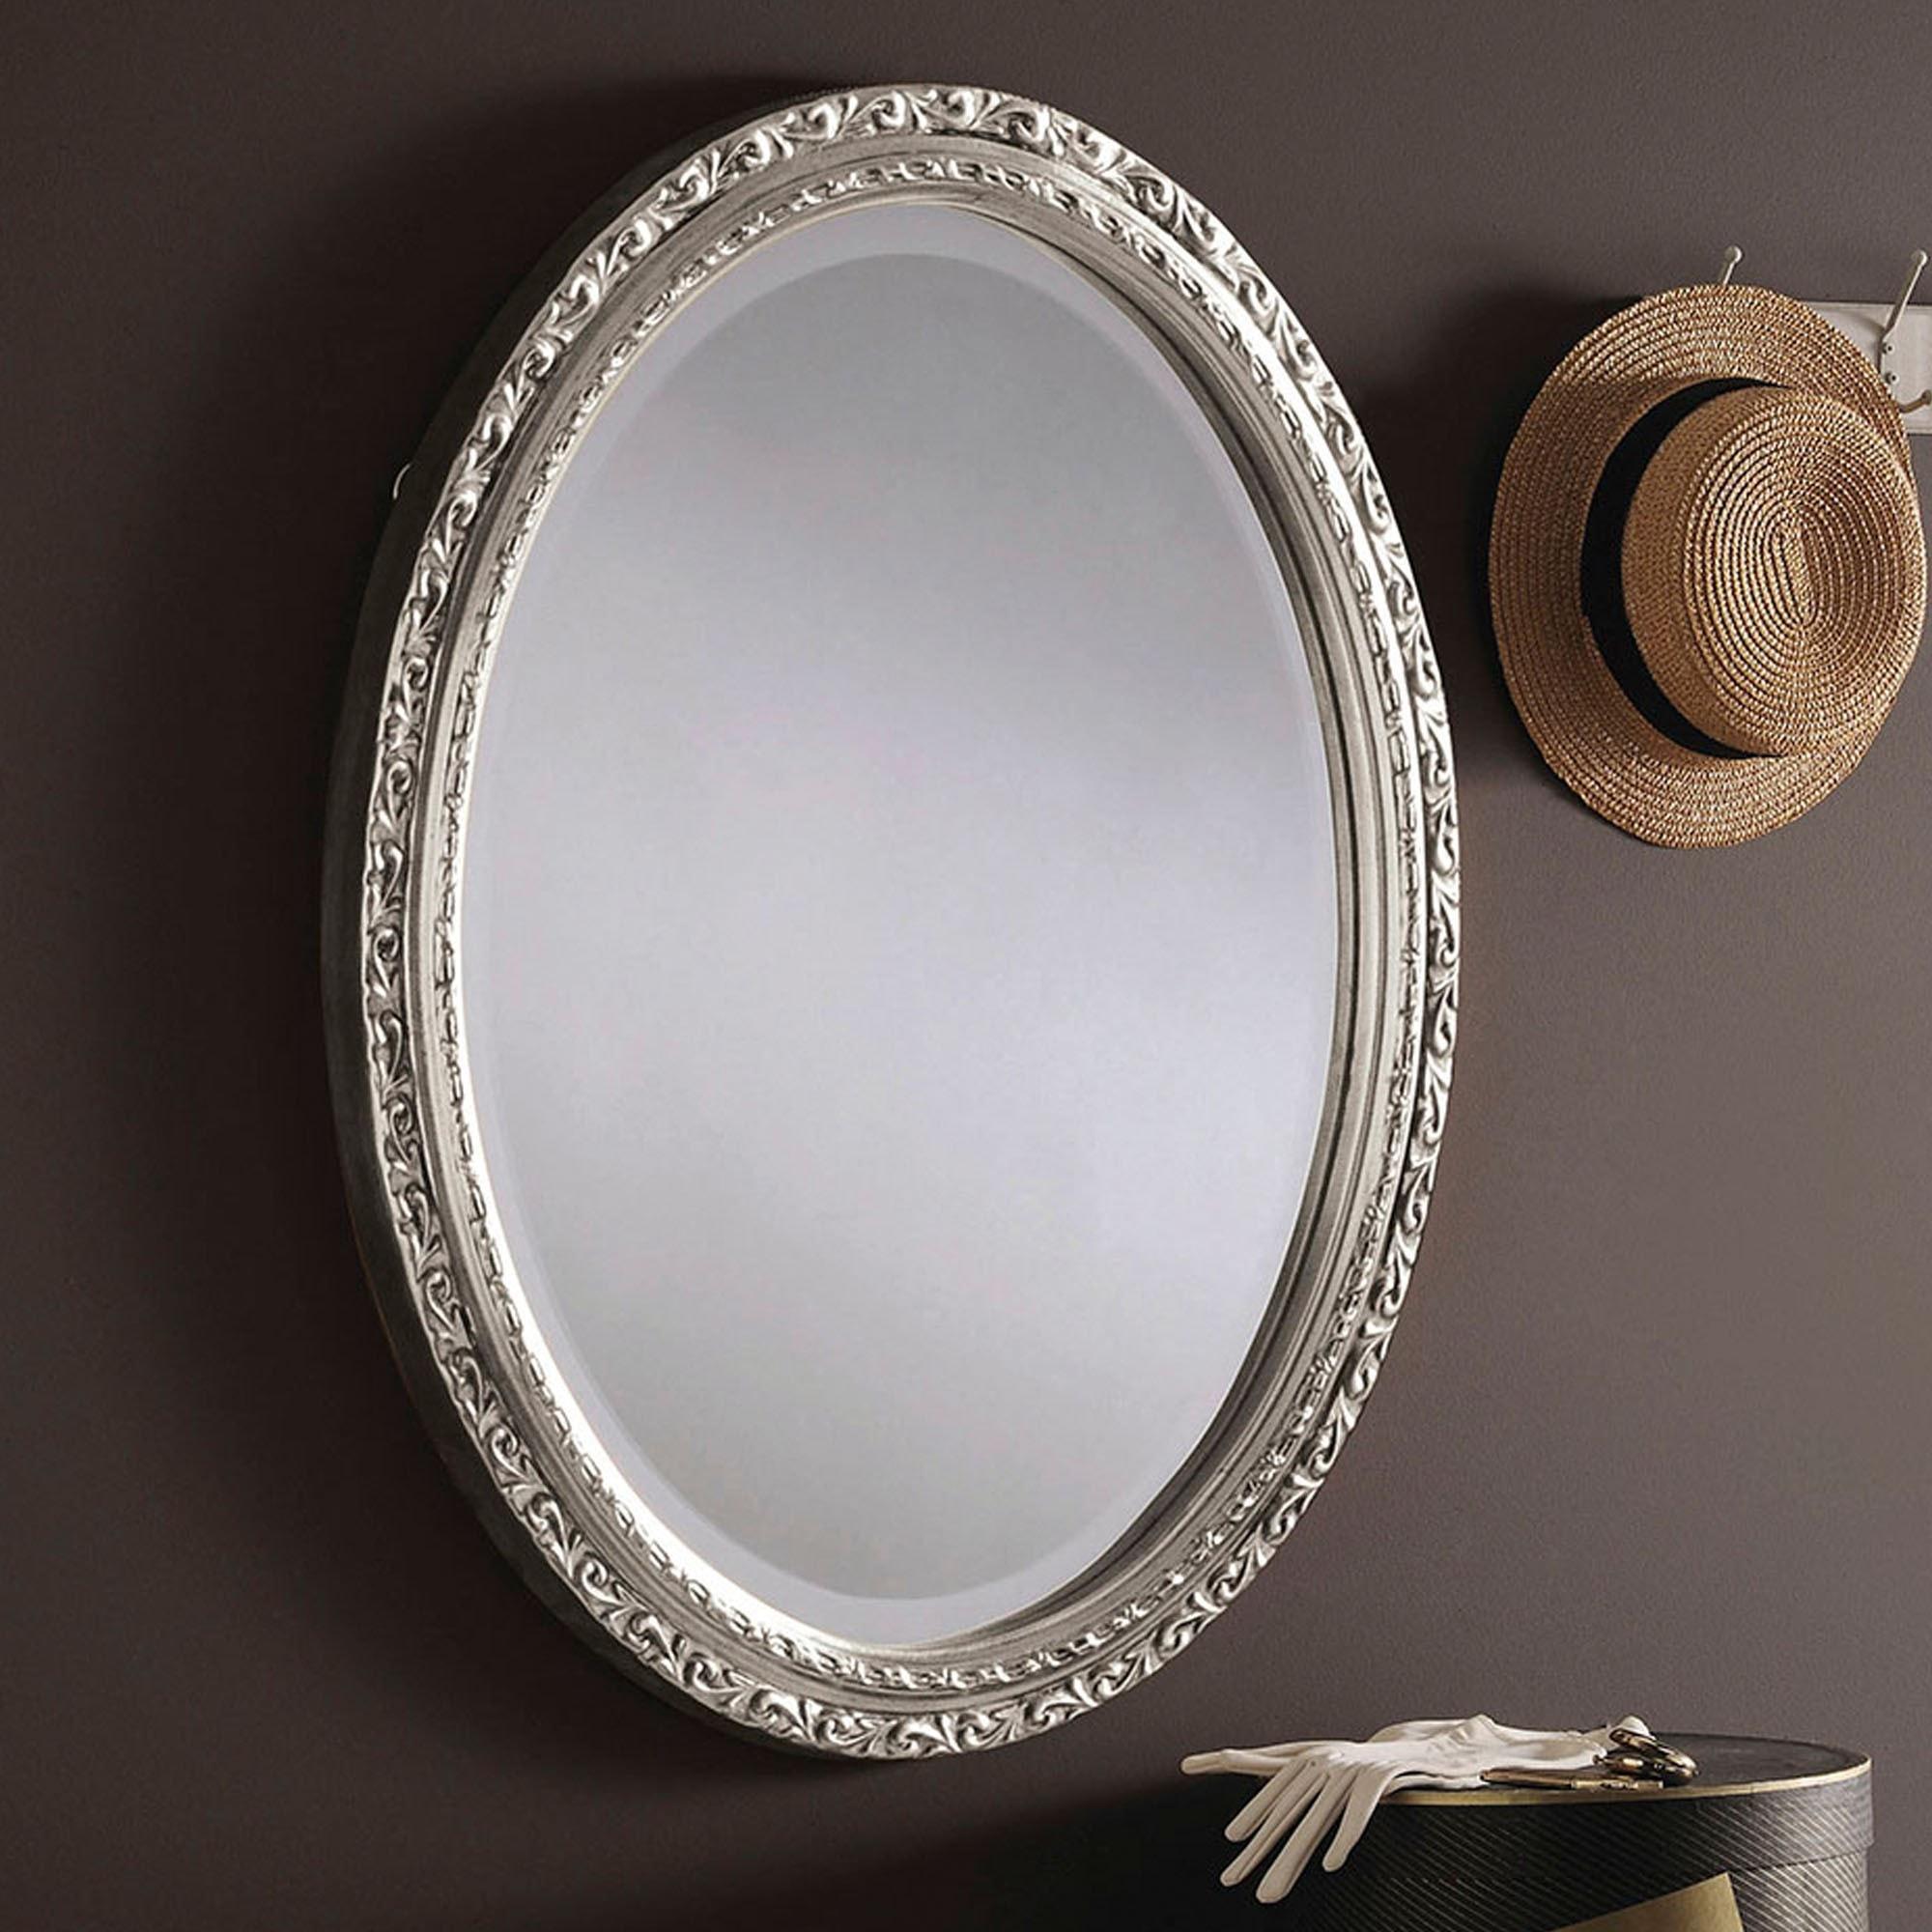 Decorative Silver Ornate Oval Wall Mirror Wall Mirrors